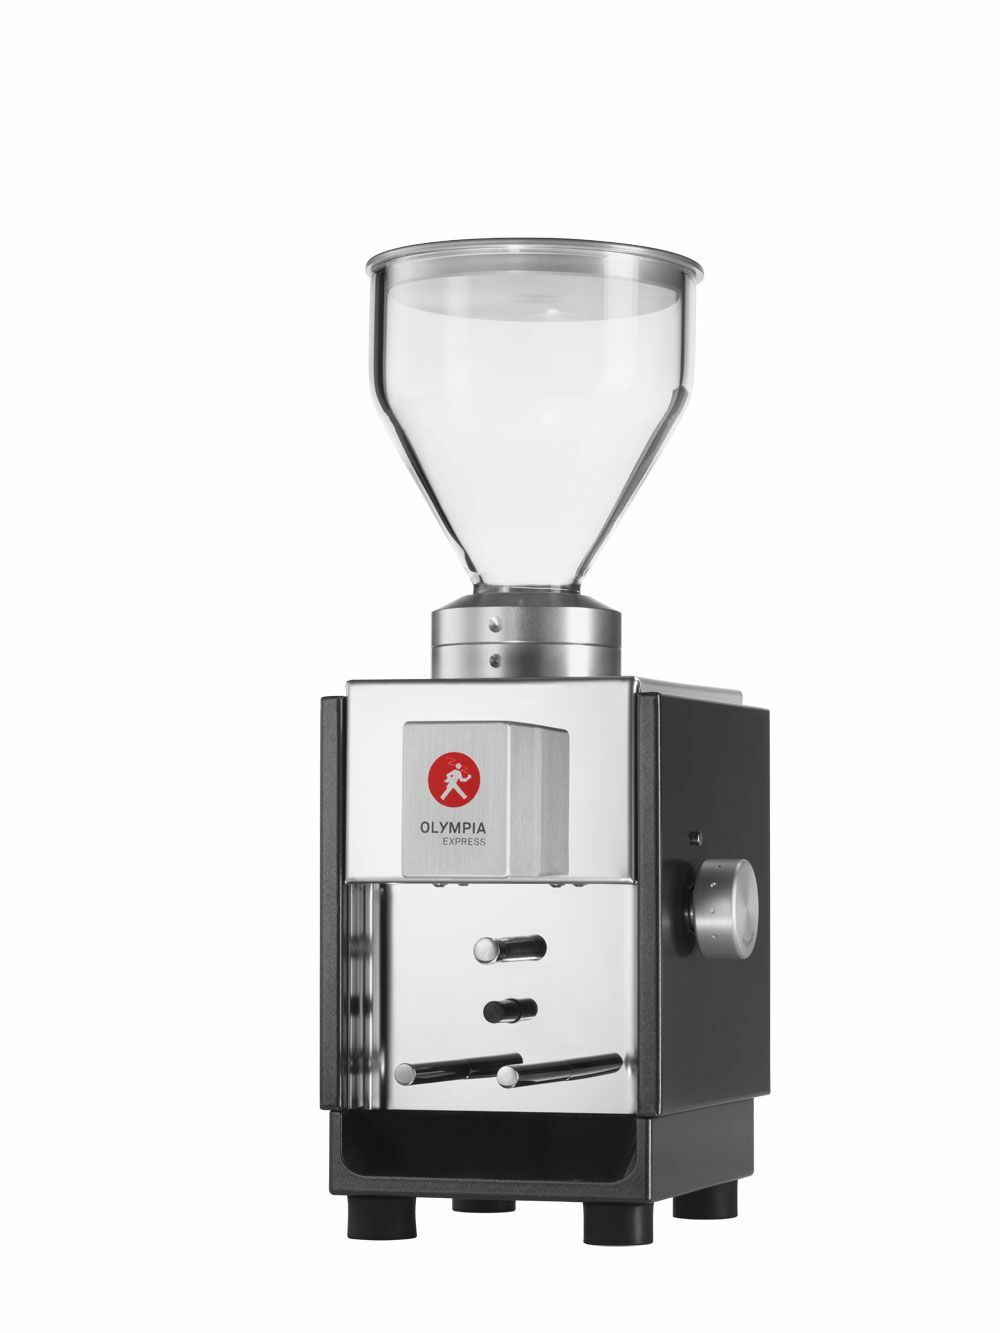 Olympia Express Moca Rot Kaffeemühle